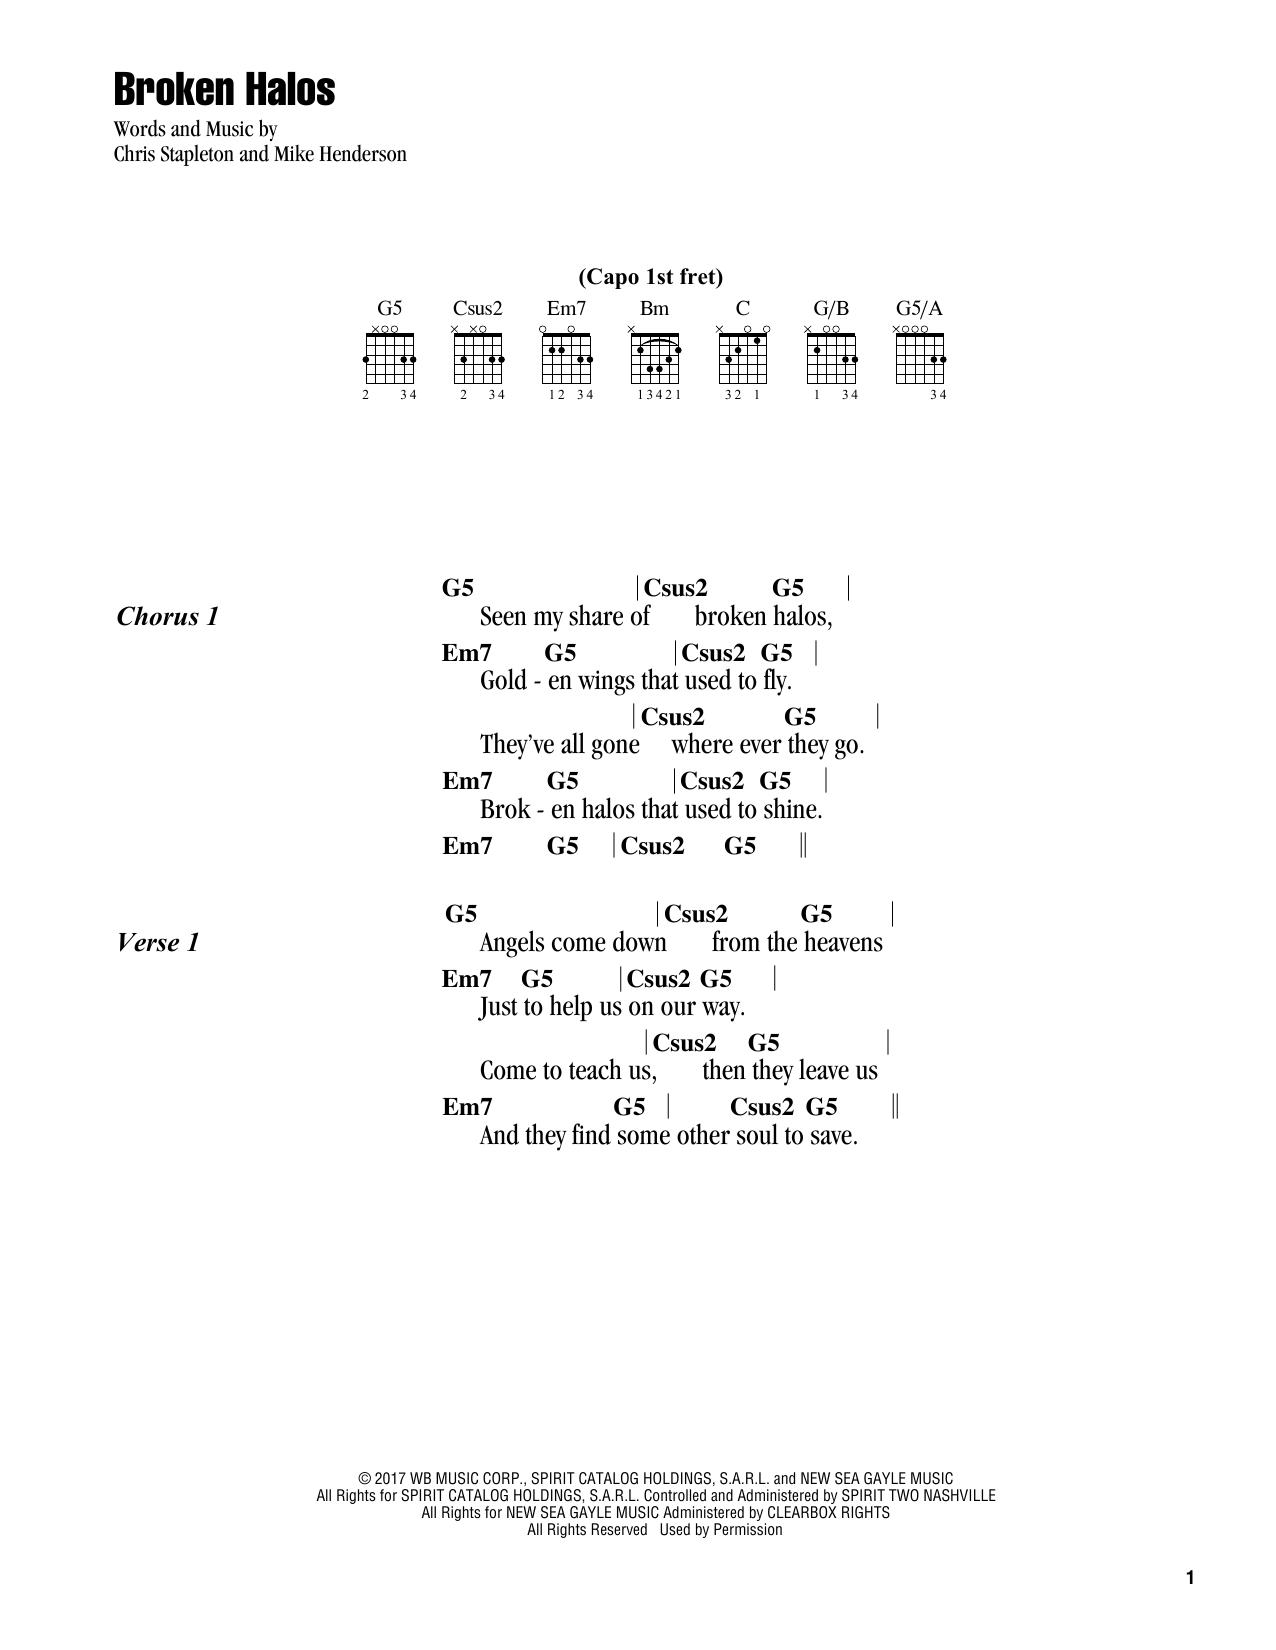 Broken halos sheet music by chris stapleton lyrics chords 186317 broken halos sheet music hexwebz Images